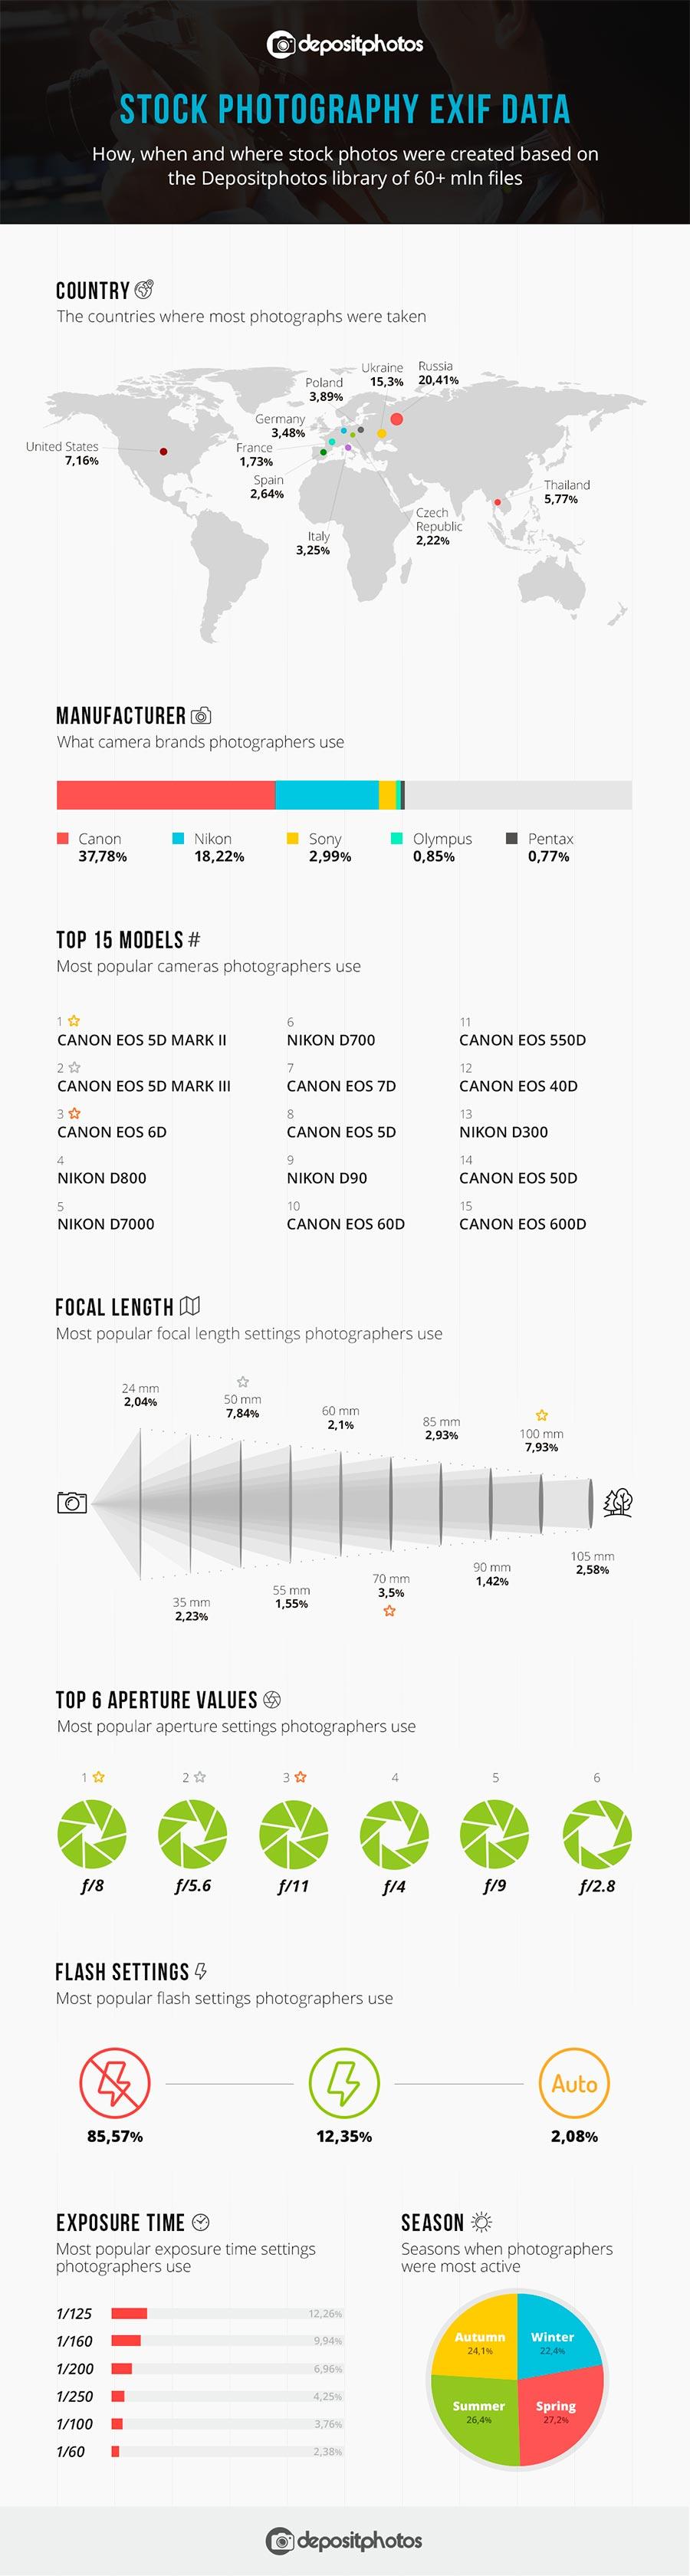 exif-stats-infogrpahic-depositphotos